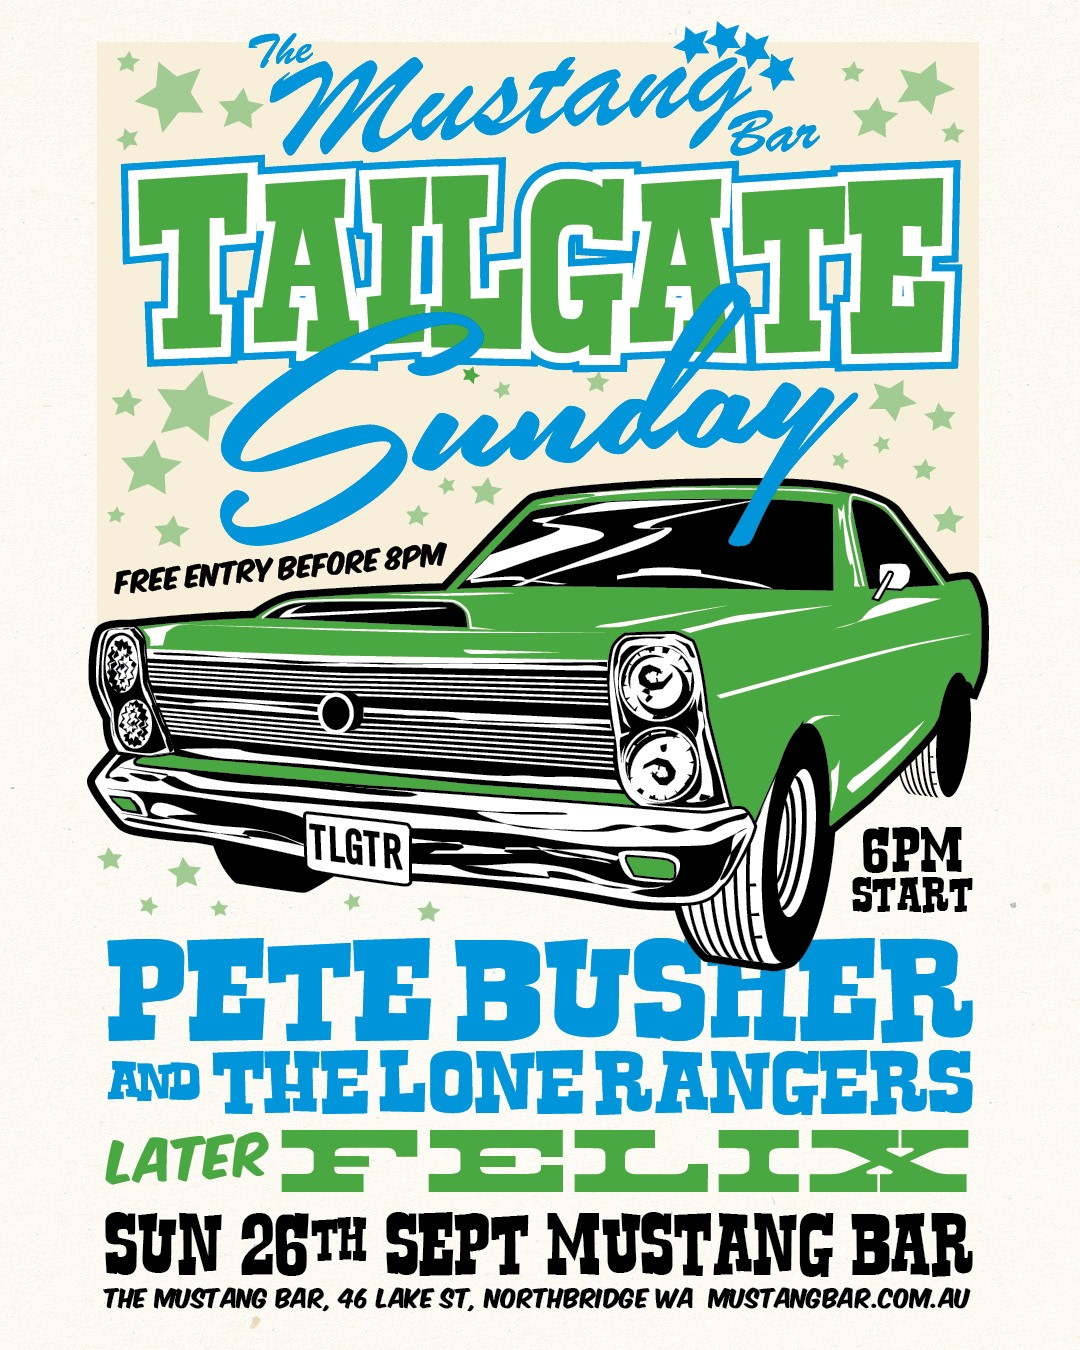 Tailgate Sunday!